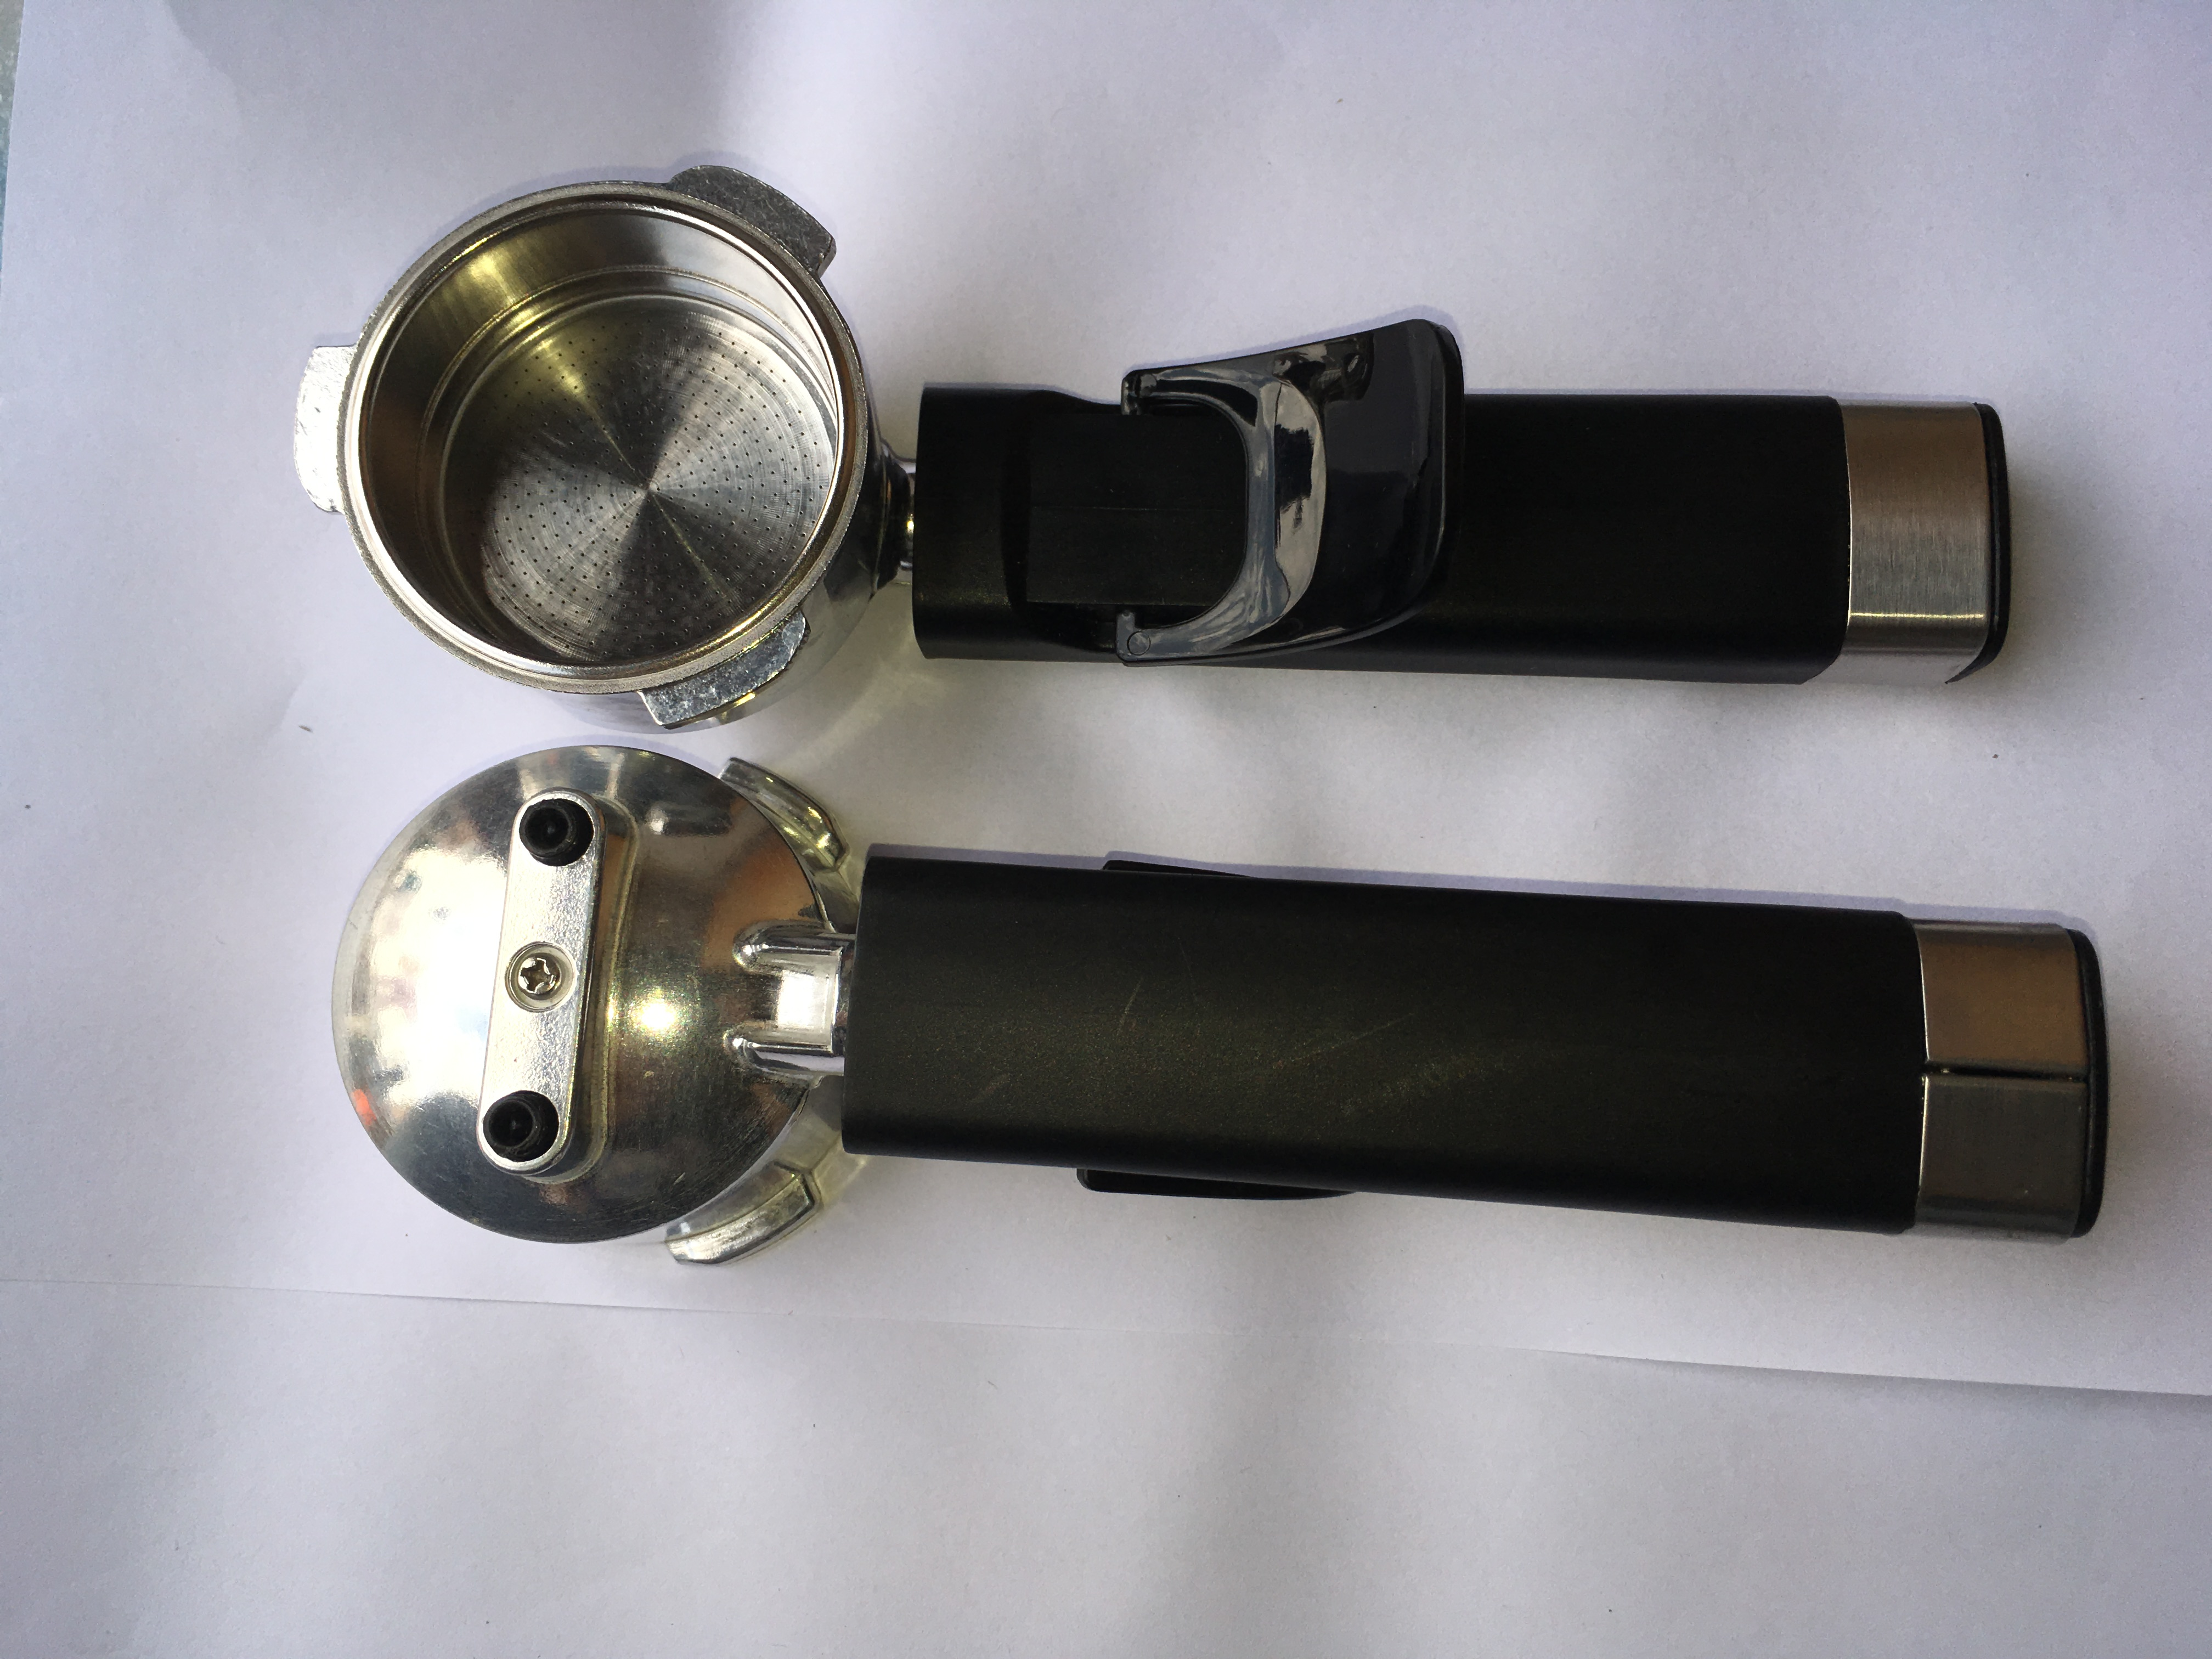 Diameter Of 60 Mm 15 Bar Espresso Coffee Maker Parts Filter Holder For Espresso Coffee Marker Type With 2 Cup Filter